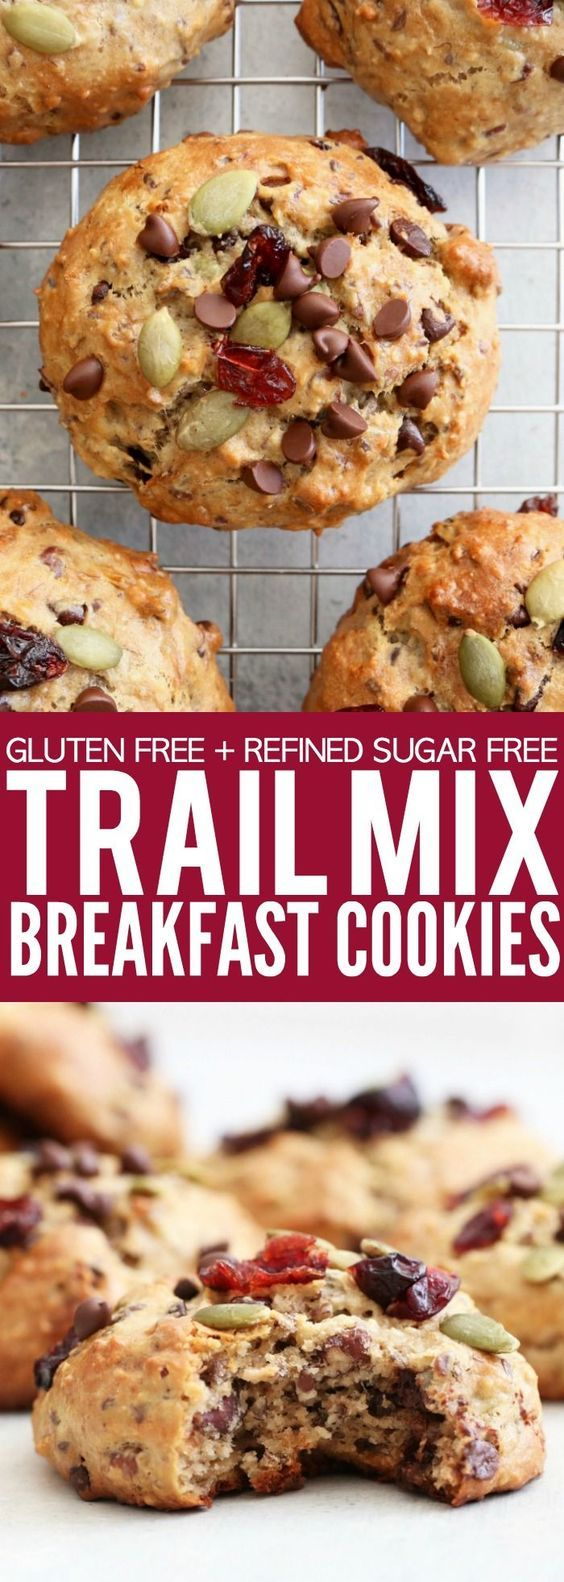 26dd2d770bdedeca3402c611be81795b I cant wait for you to try these gluten free + refined sugar free Trail Mix Bre...